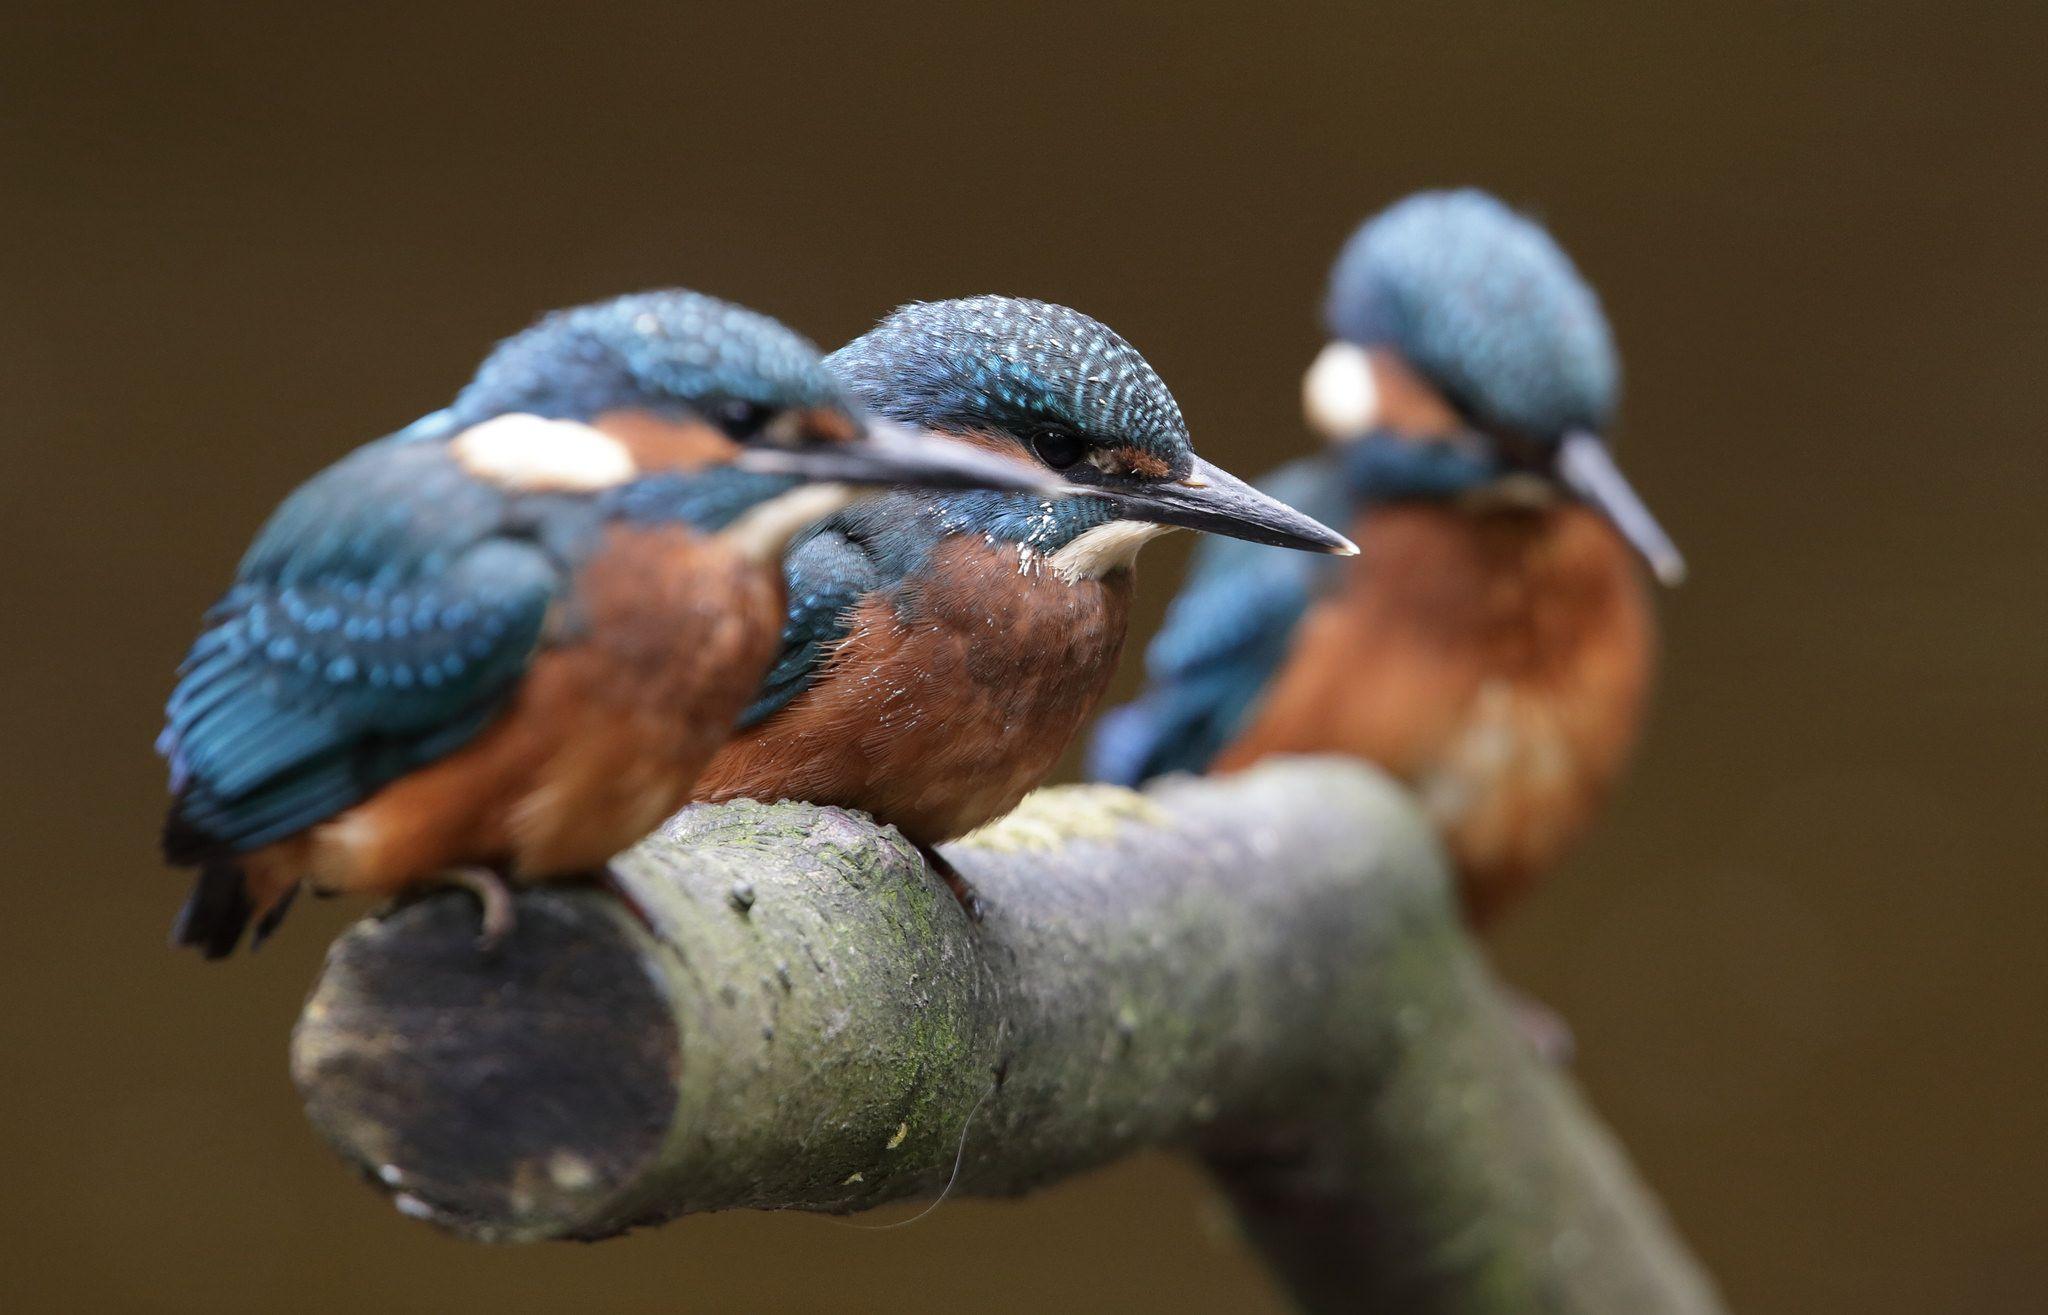 Kingfisher...2012. Kingfisher, Kingfisher bird